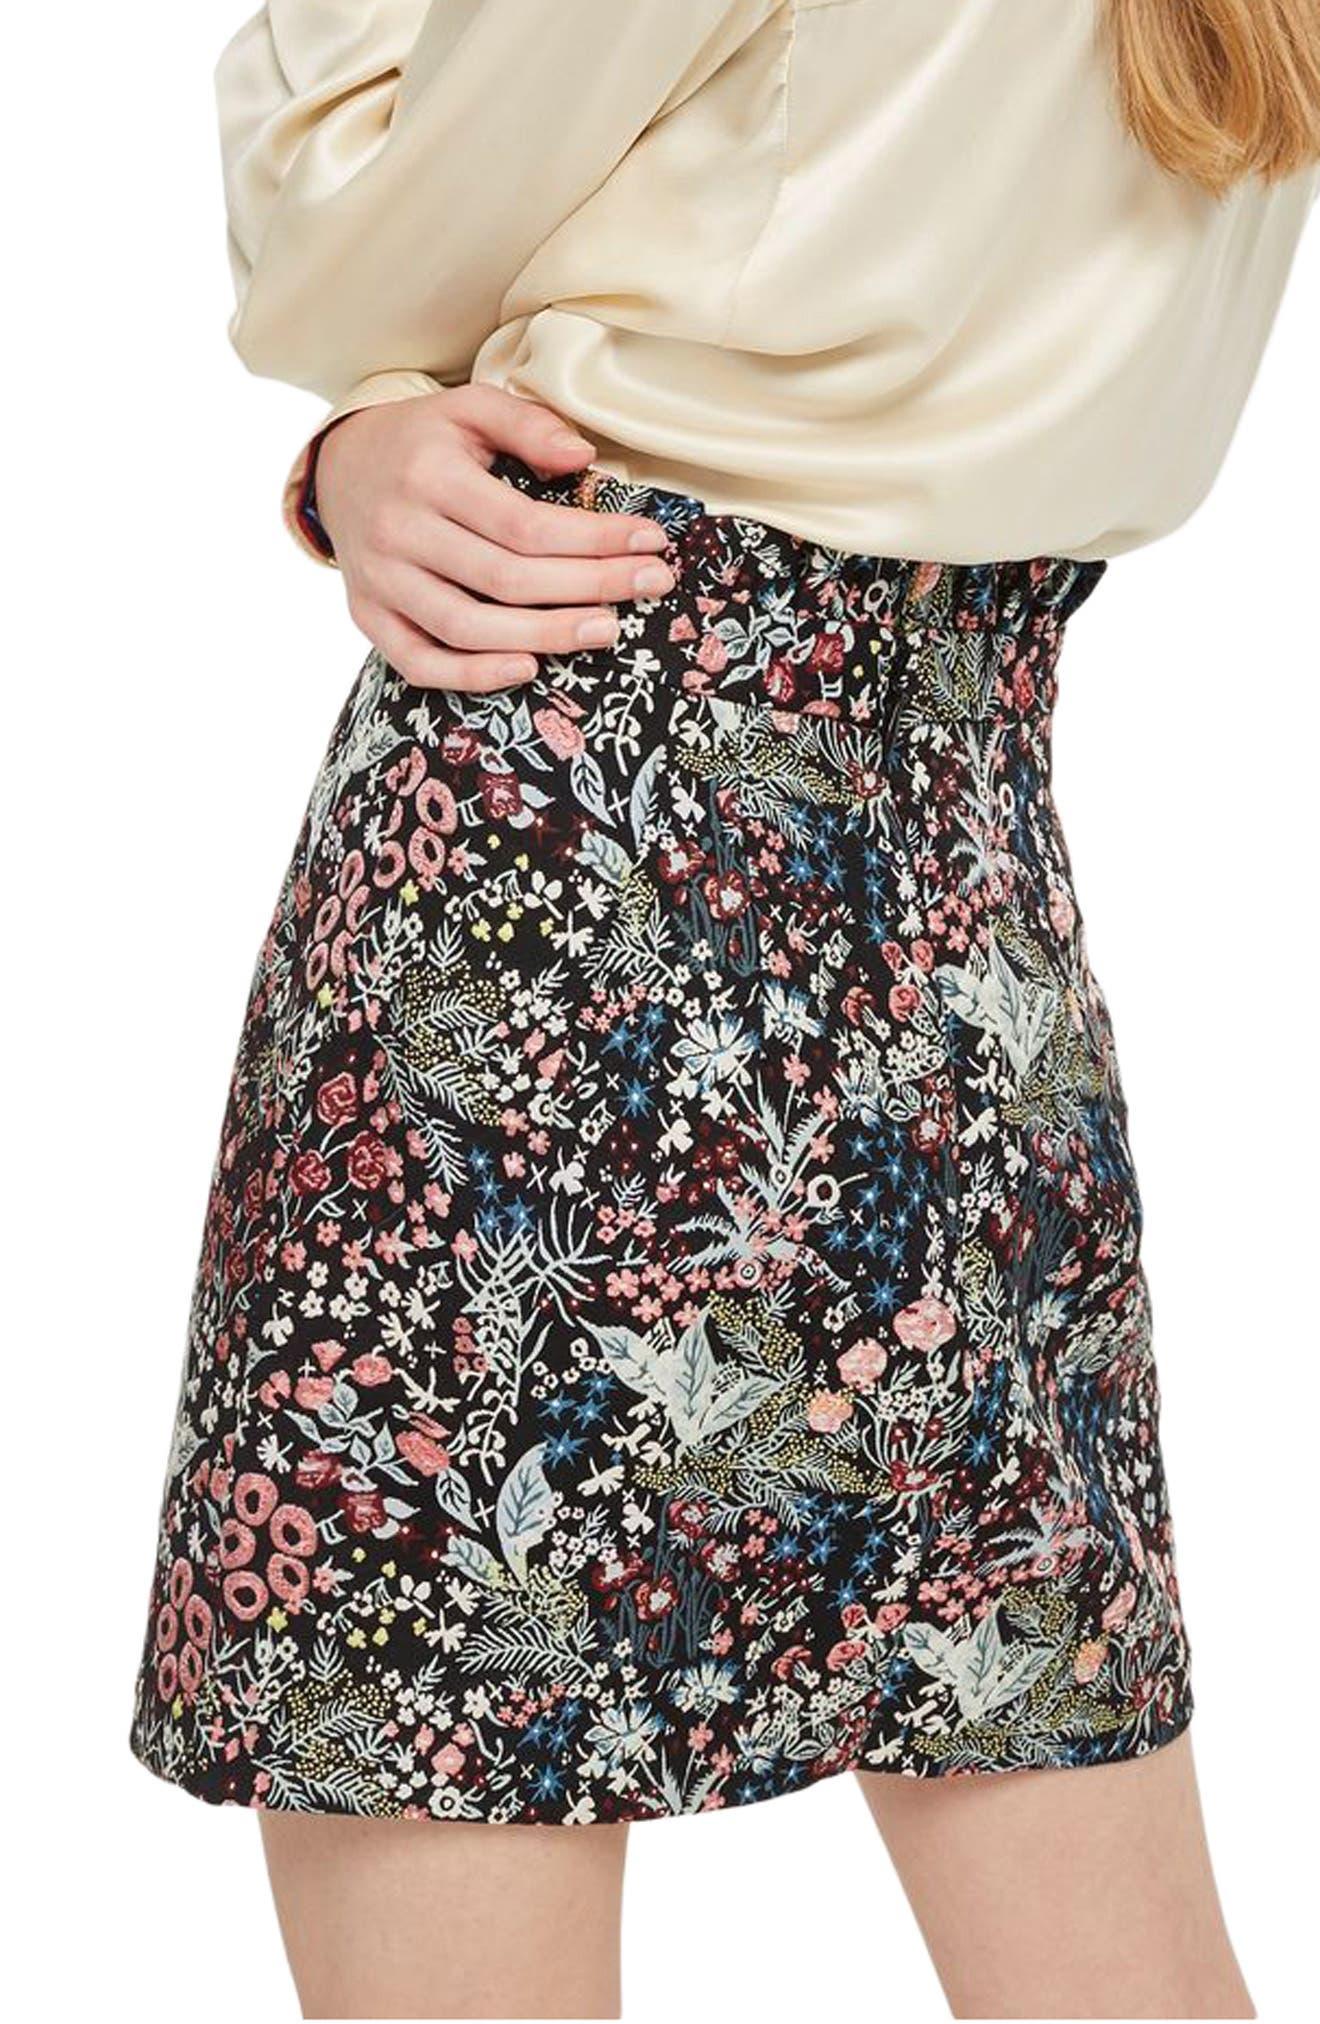 Woodland Jacquard Skirt,                             Alternate thumbnail 2, color,                             001